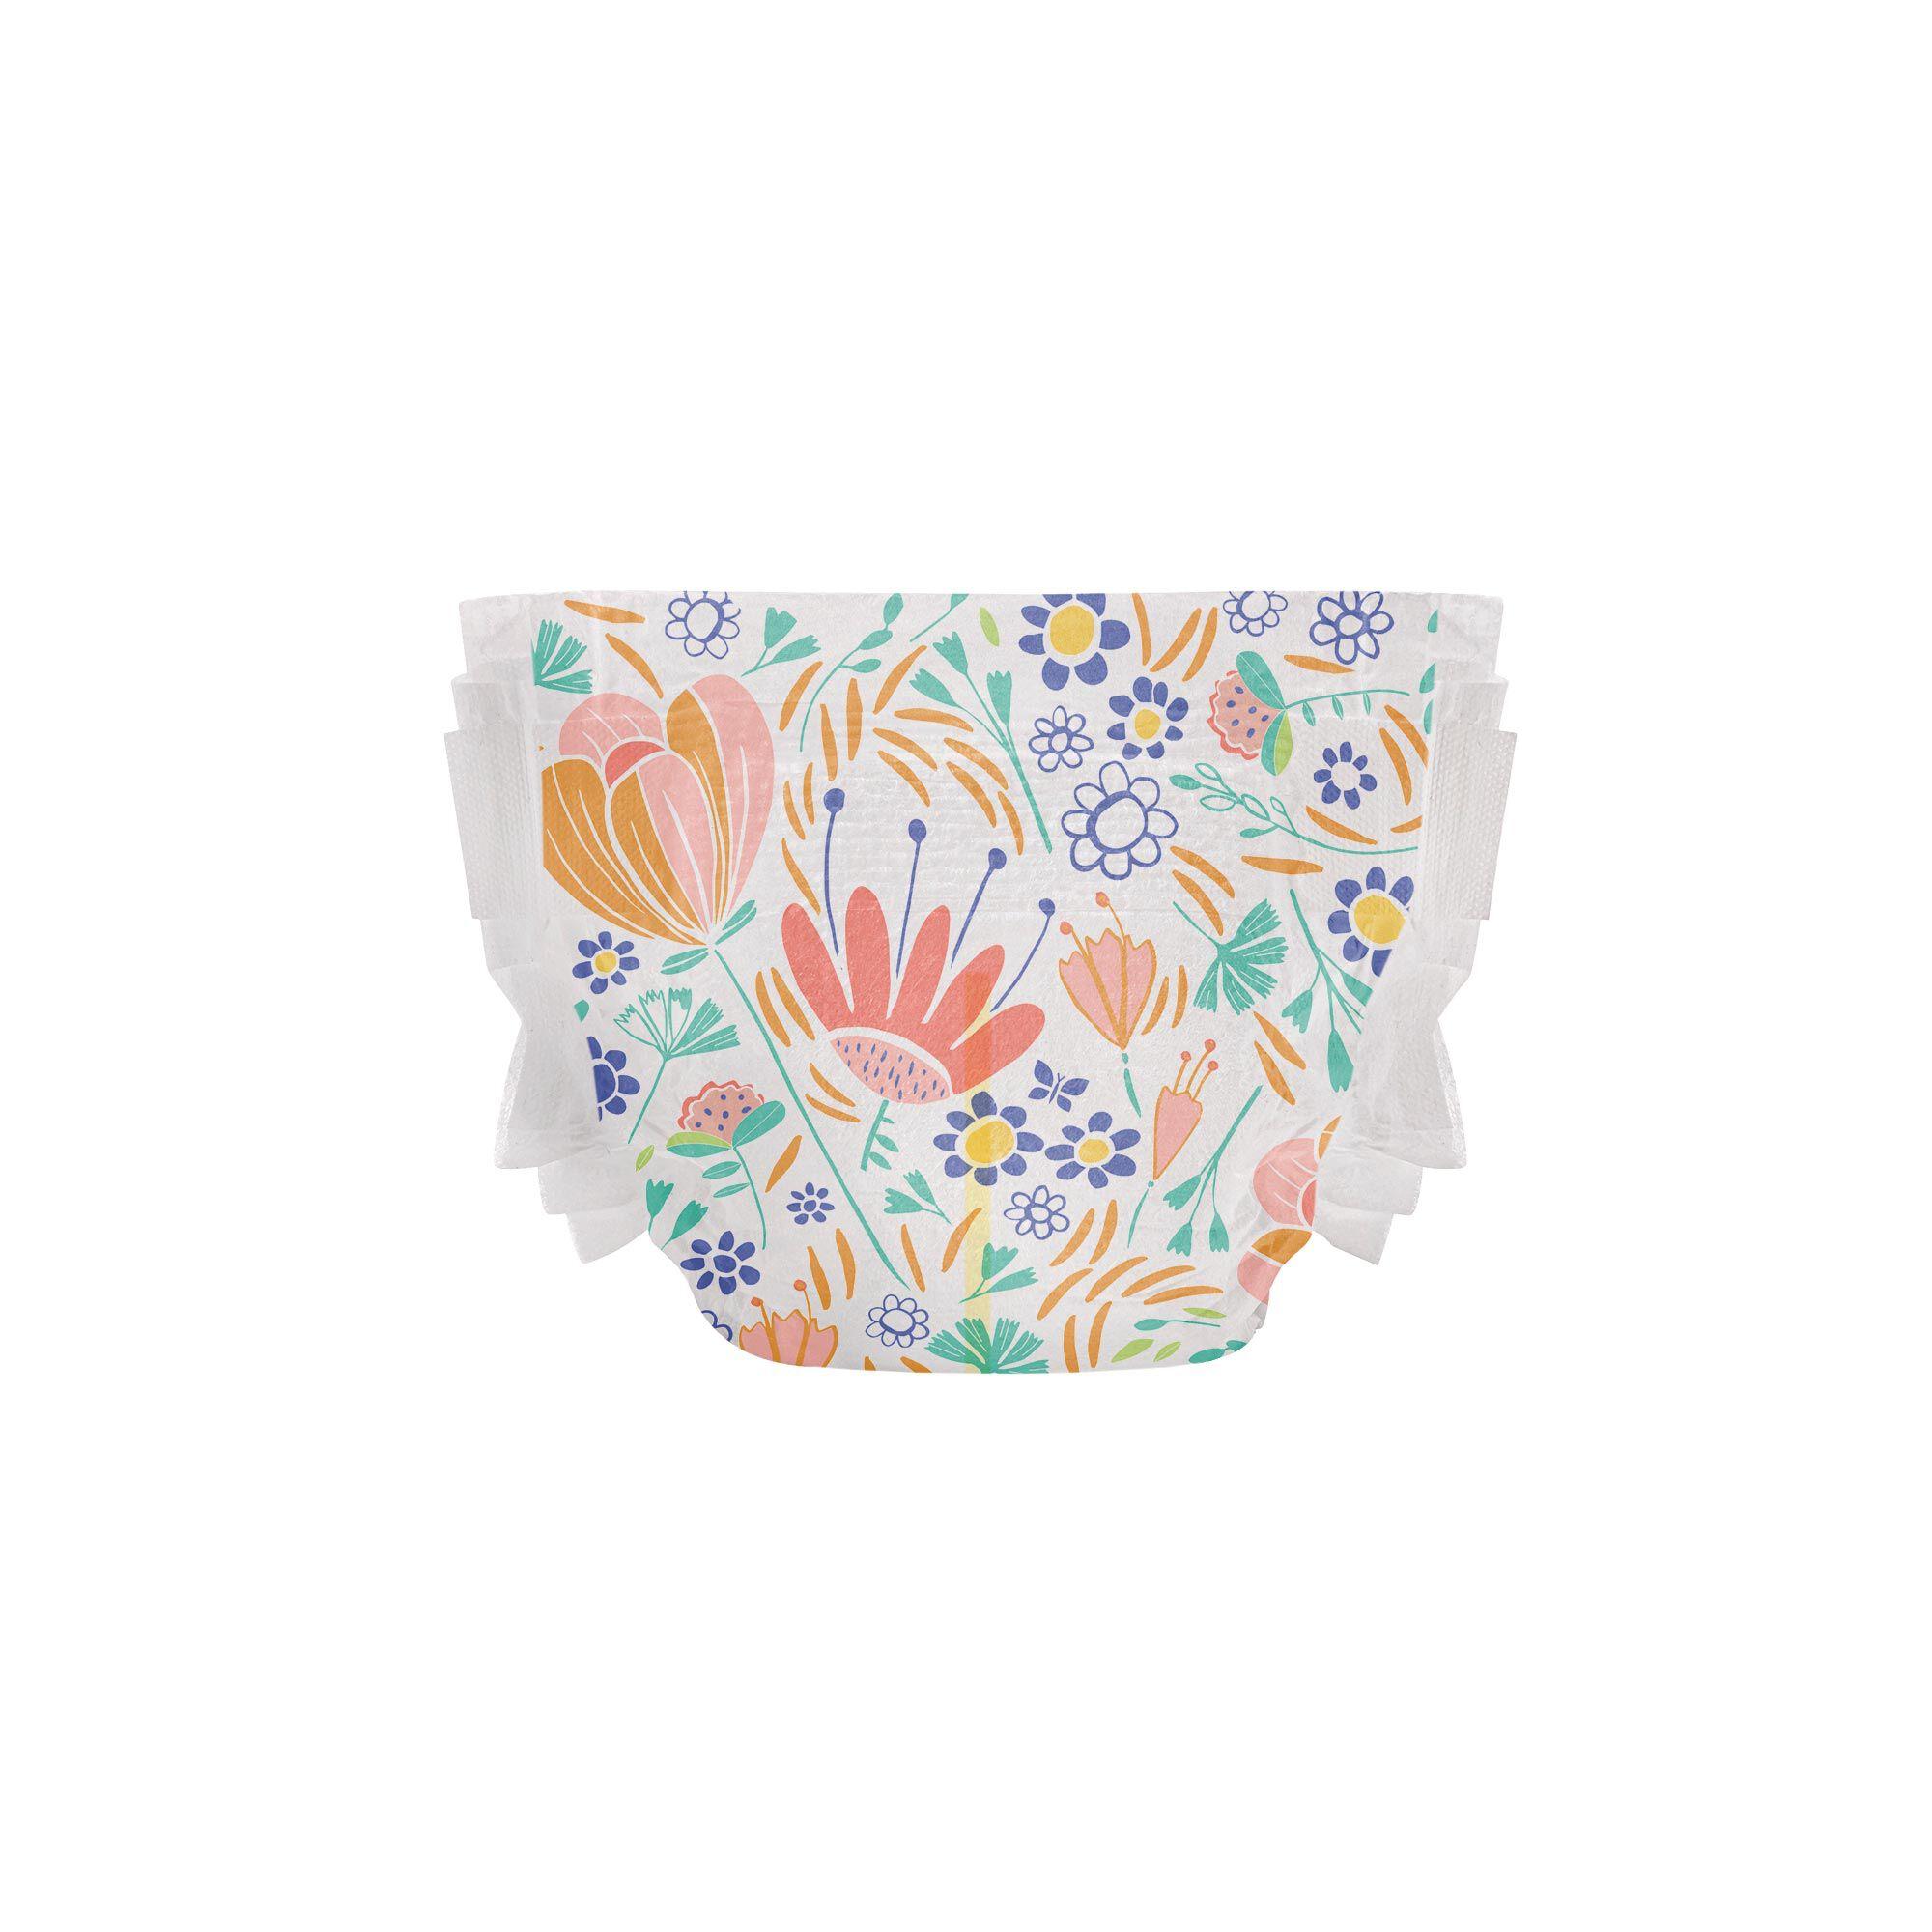 Clean Conscious Diaper, Flower Power, Size 4